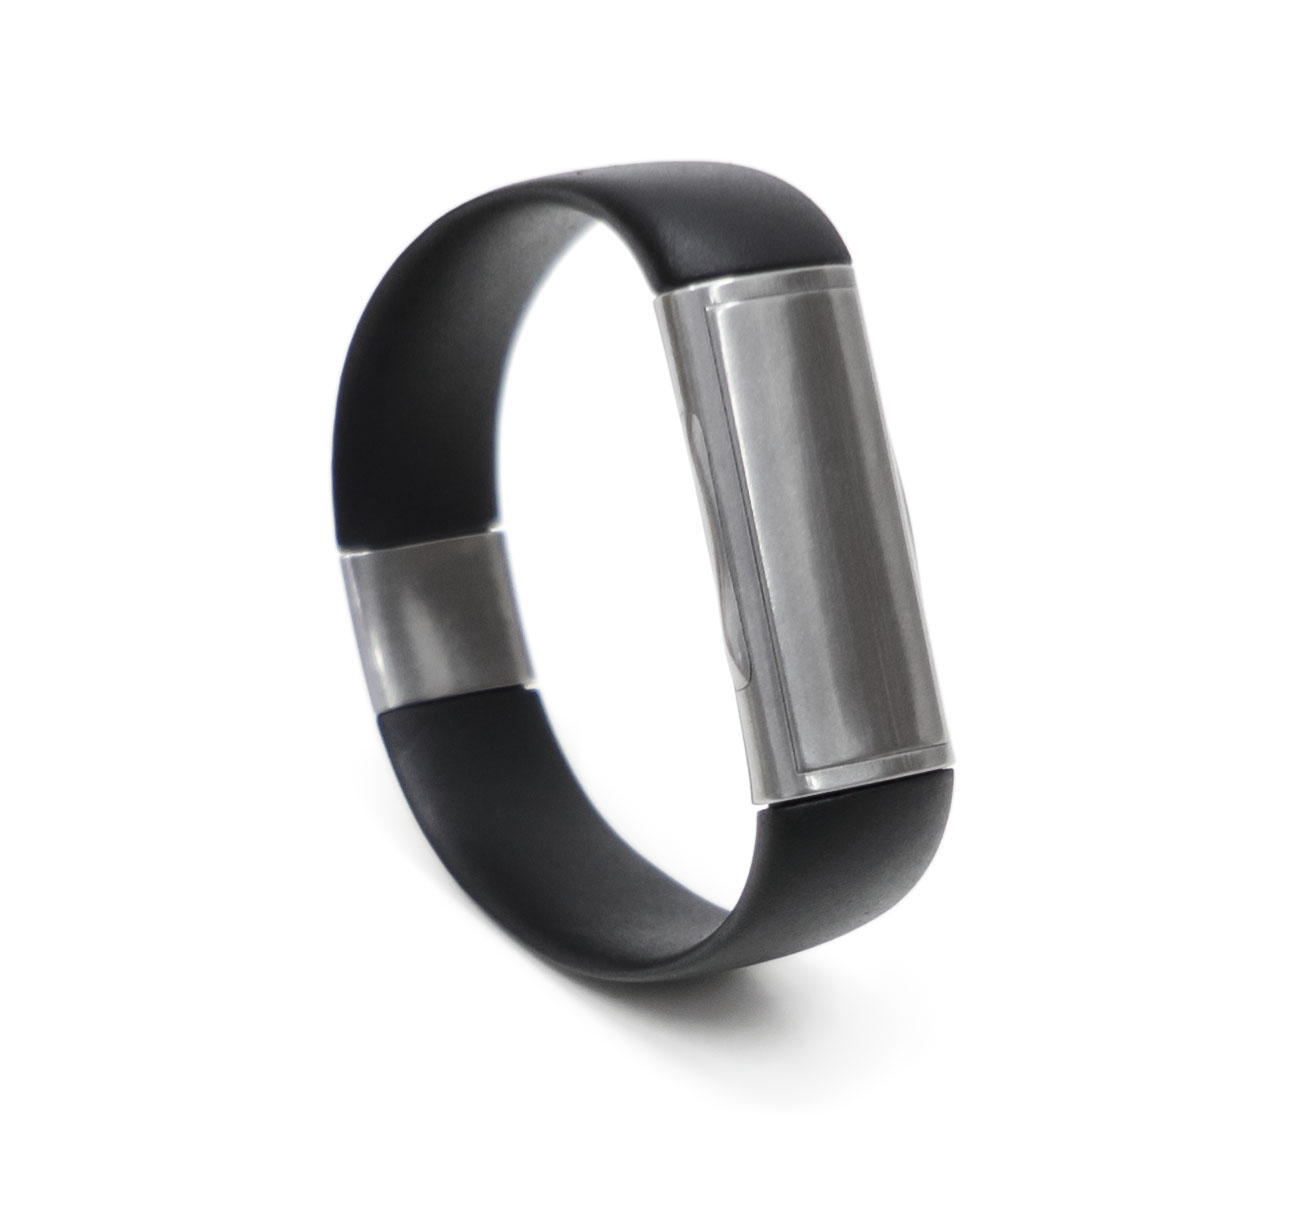 sportwatch-3d-tlac-3d-printing-tvar-tvaroch-24